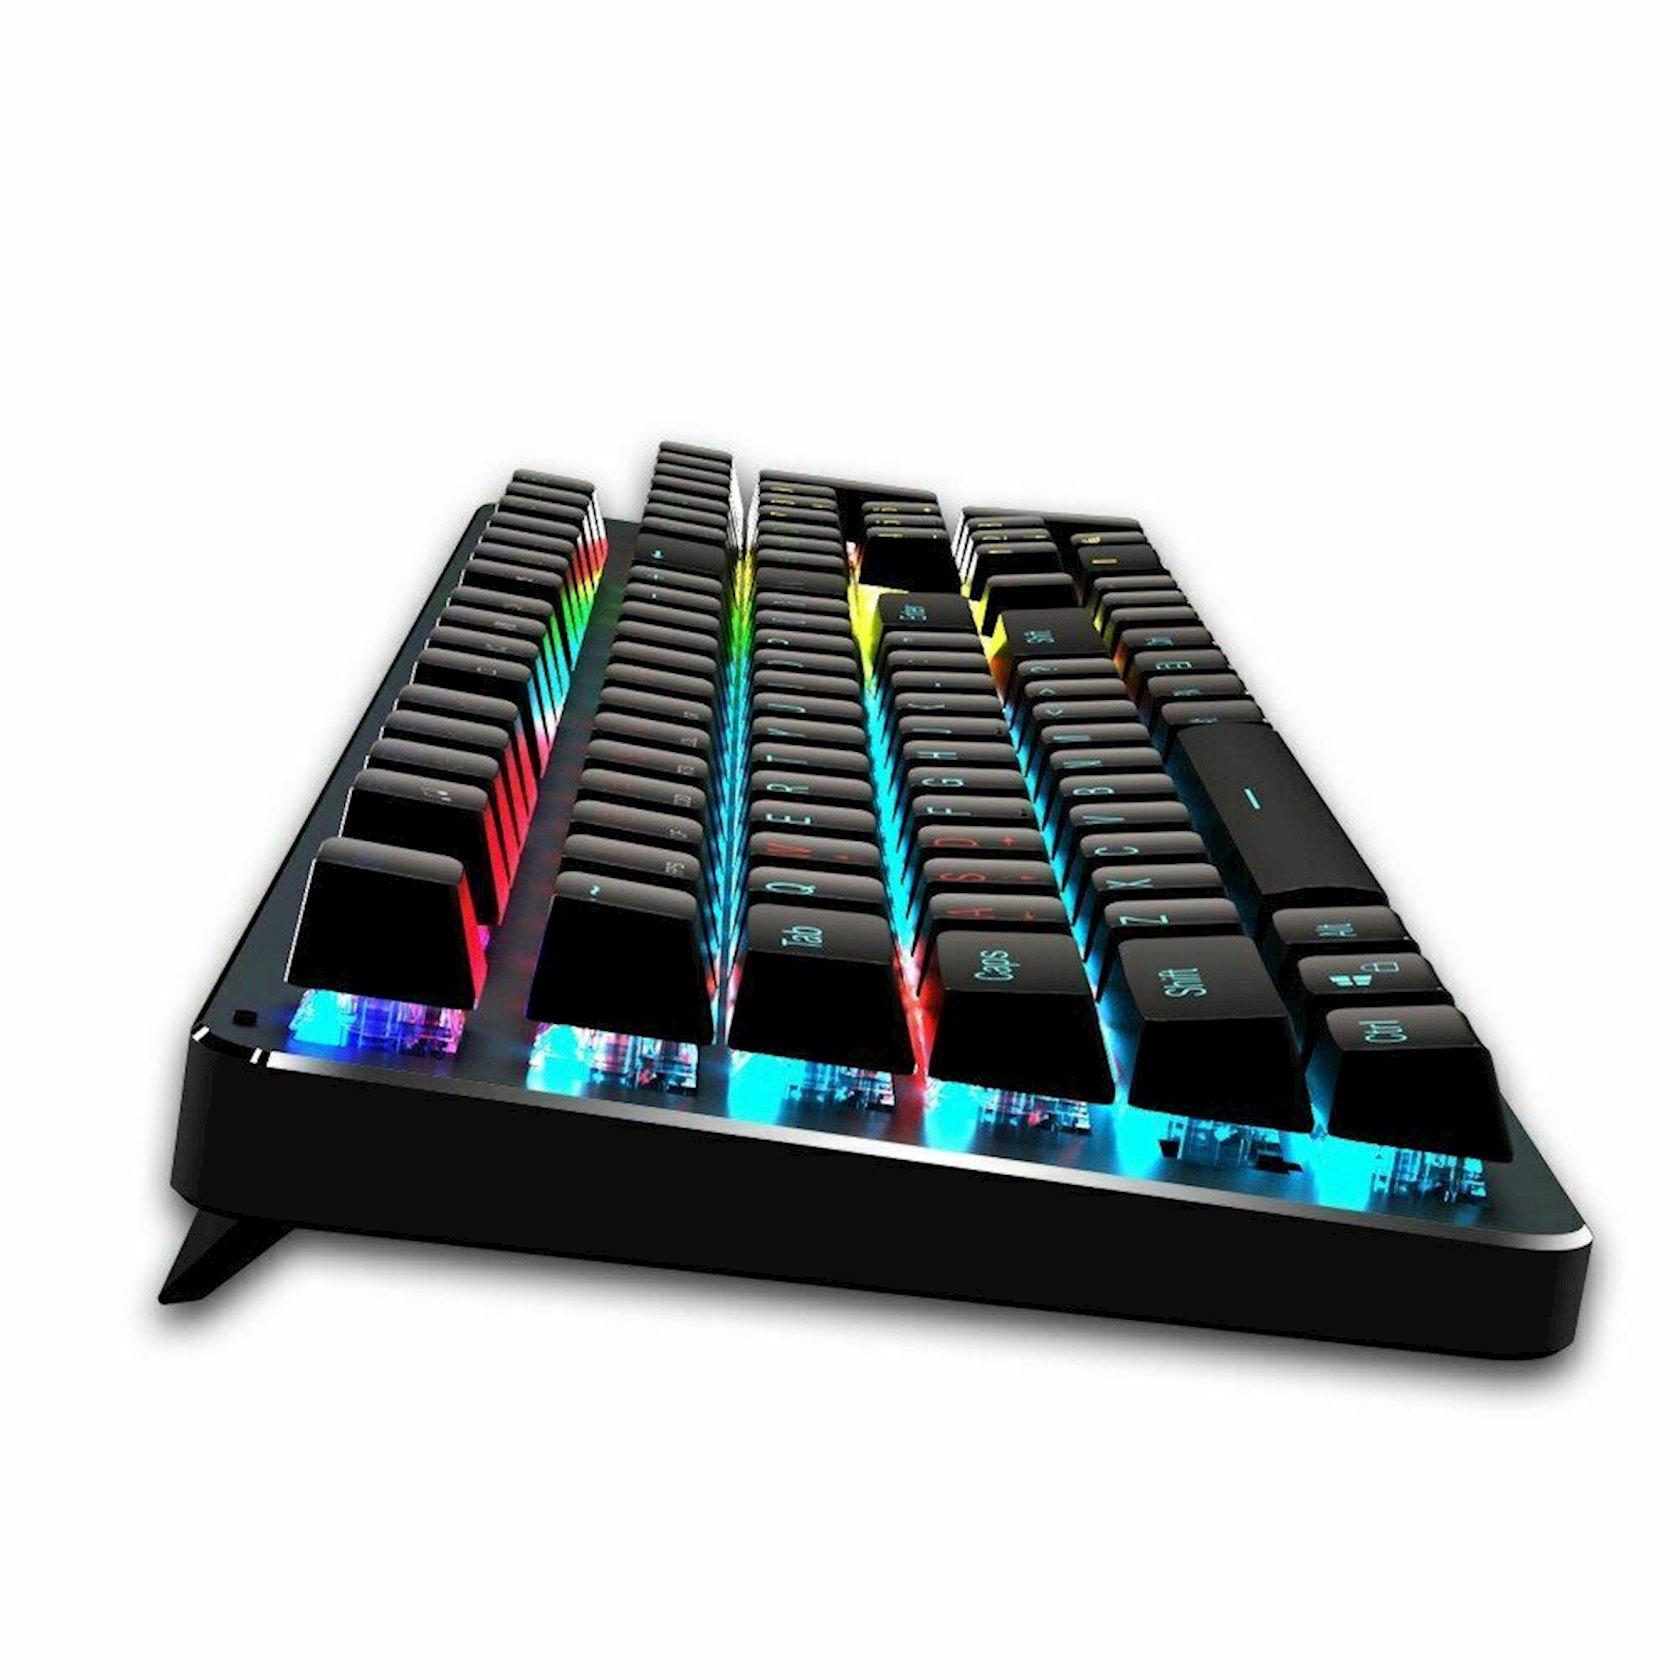 LED mexaniki oyun klaviaturası Meetion MK007